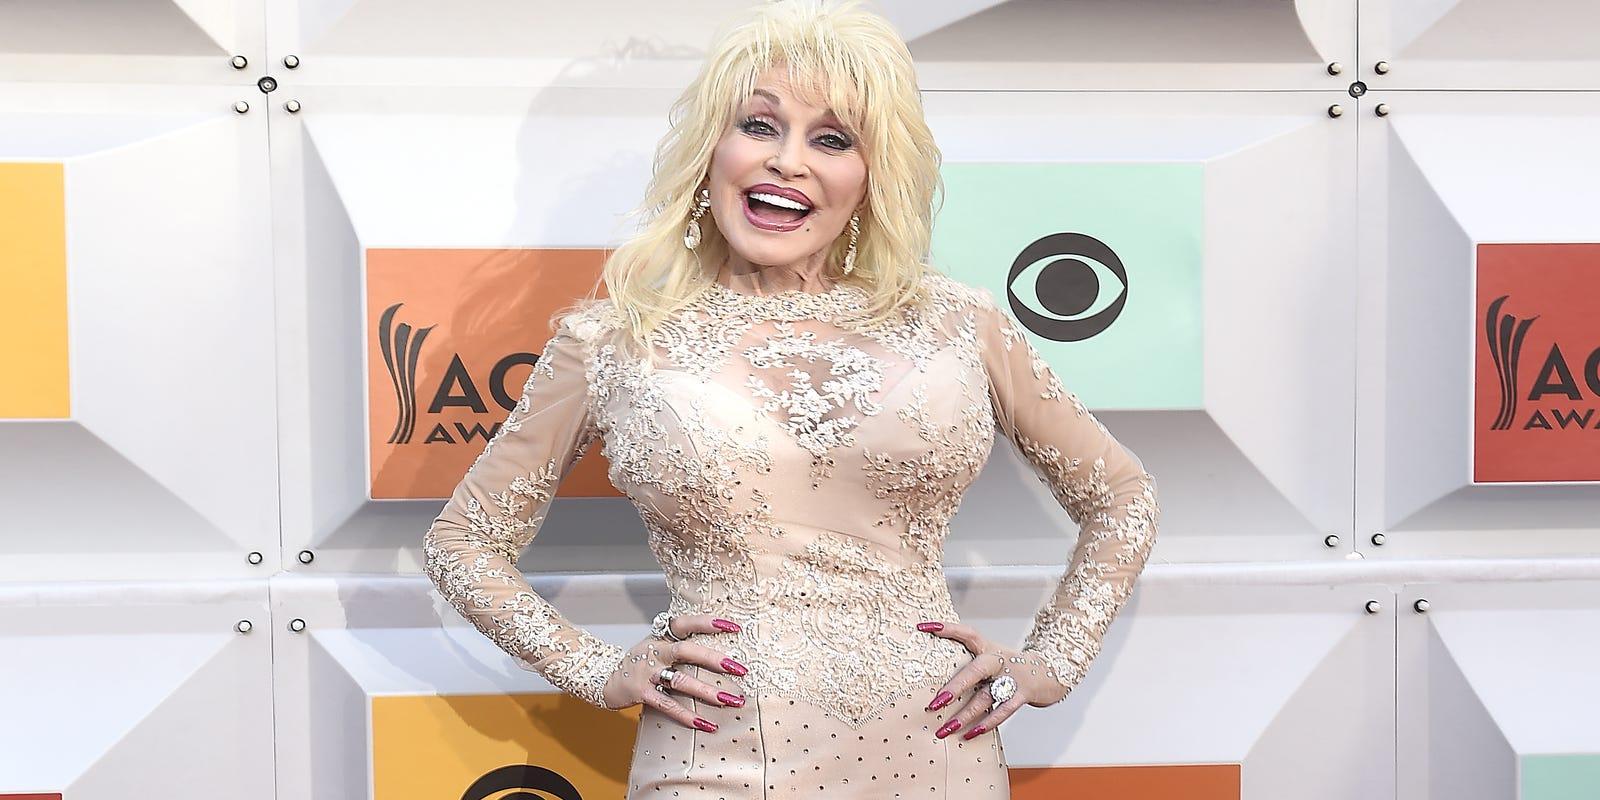 Dolly Parton Nextflix Series Julianne Hough To Star As Jolene